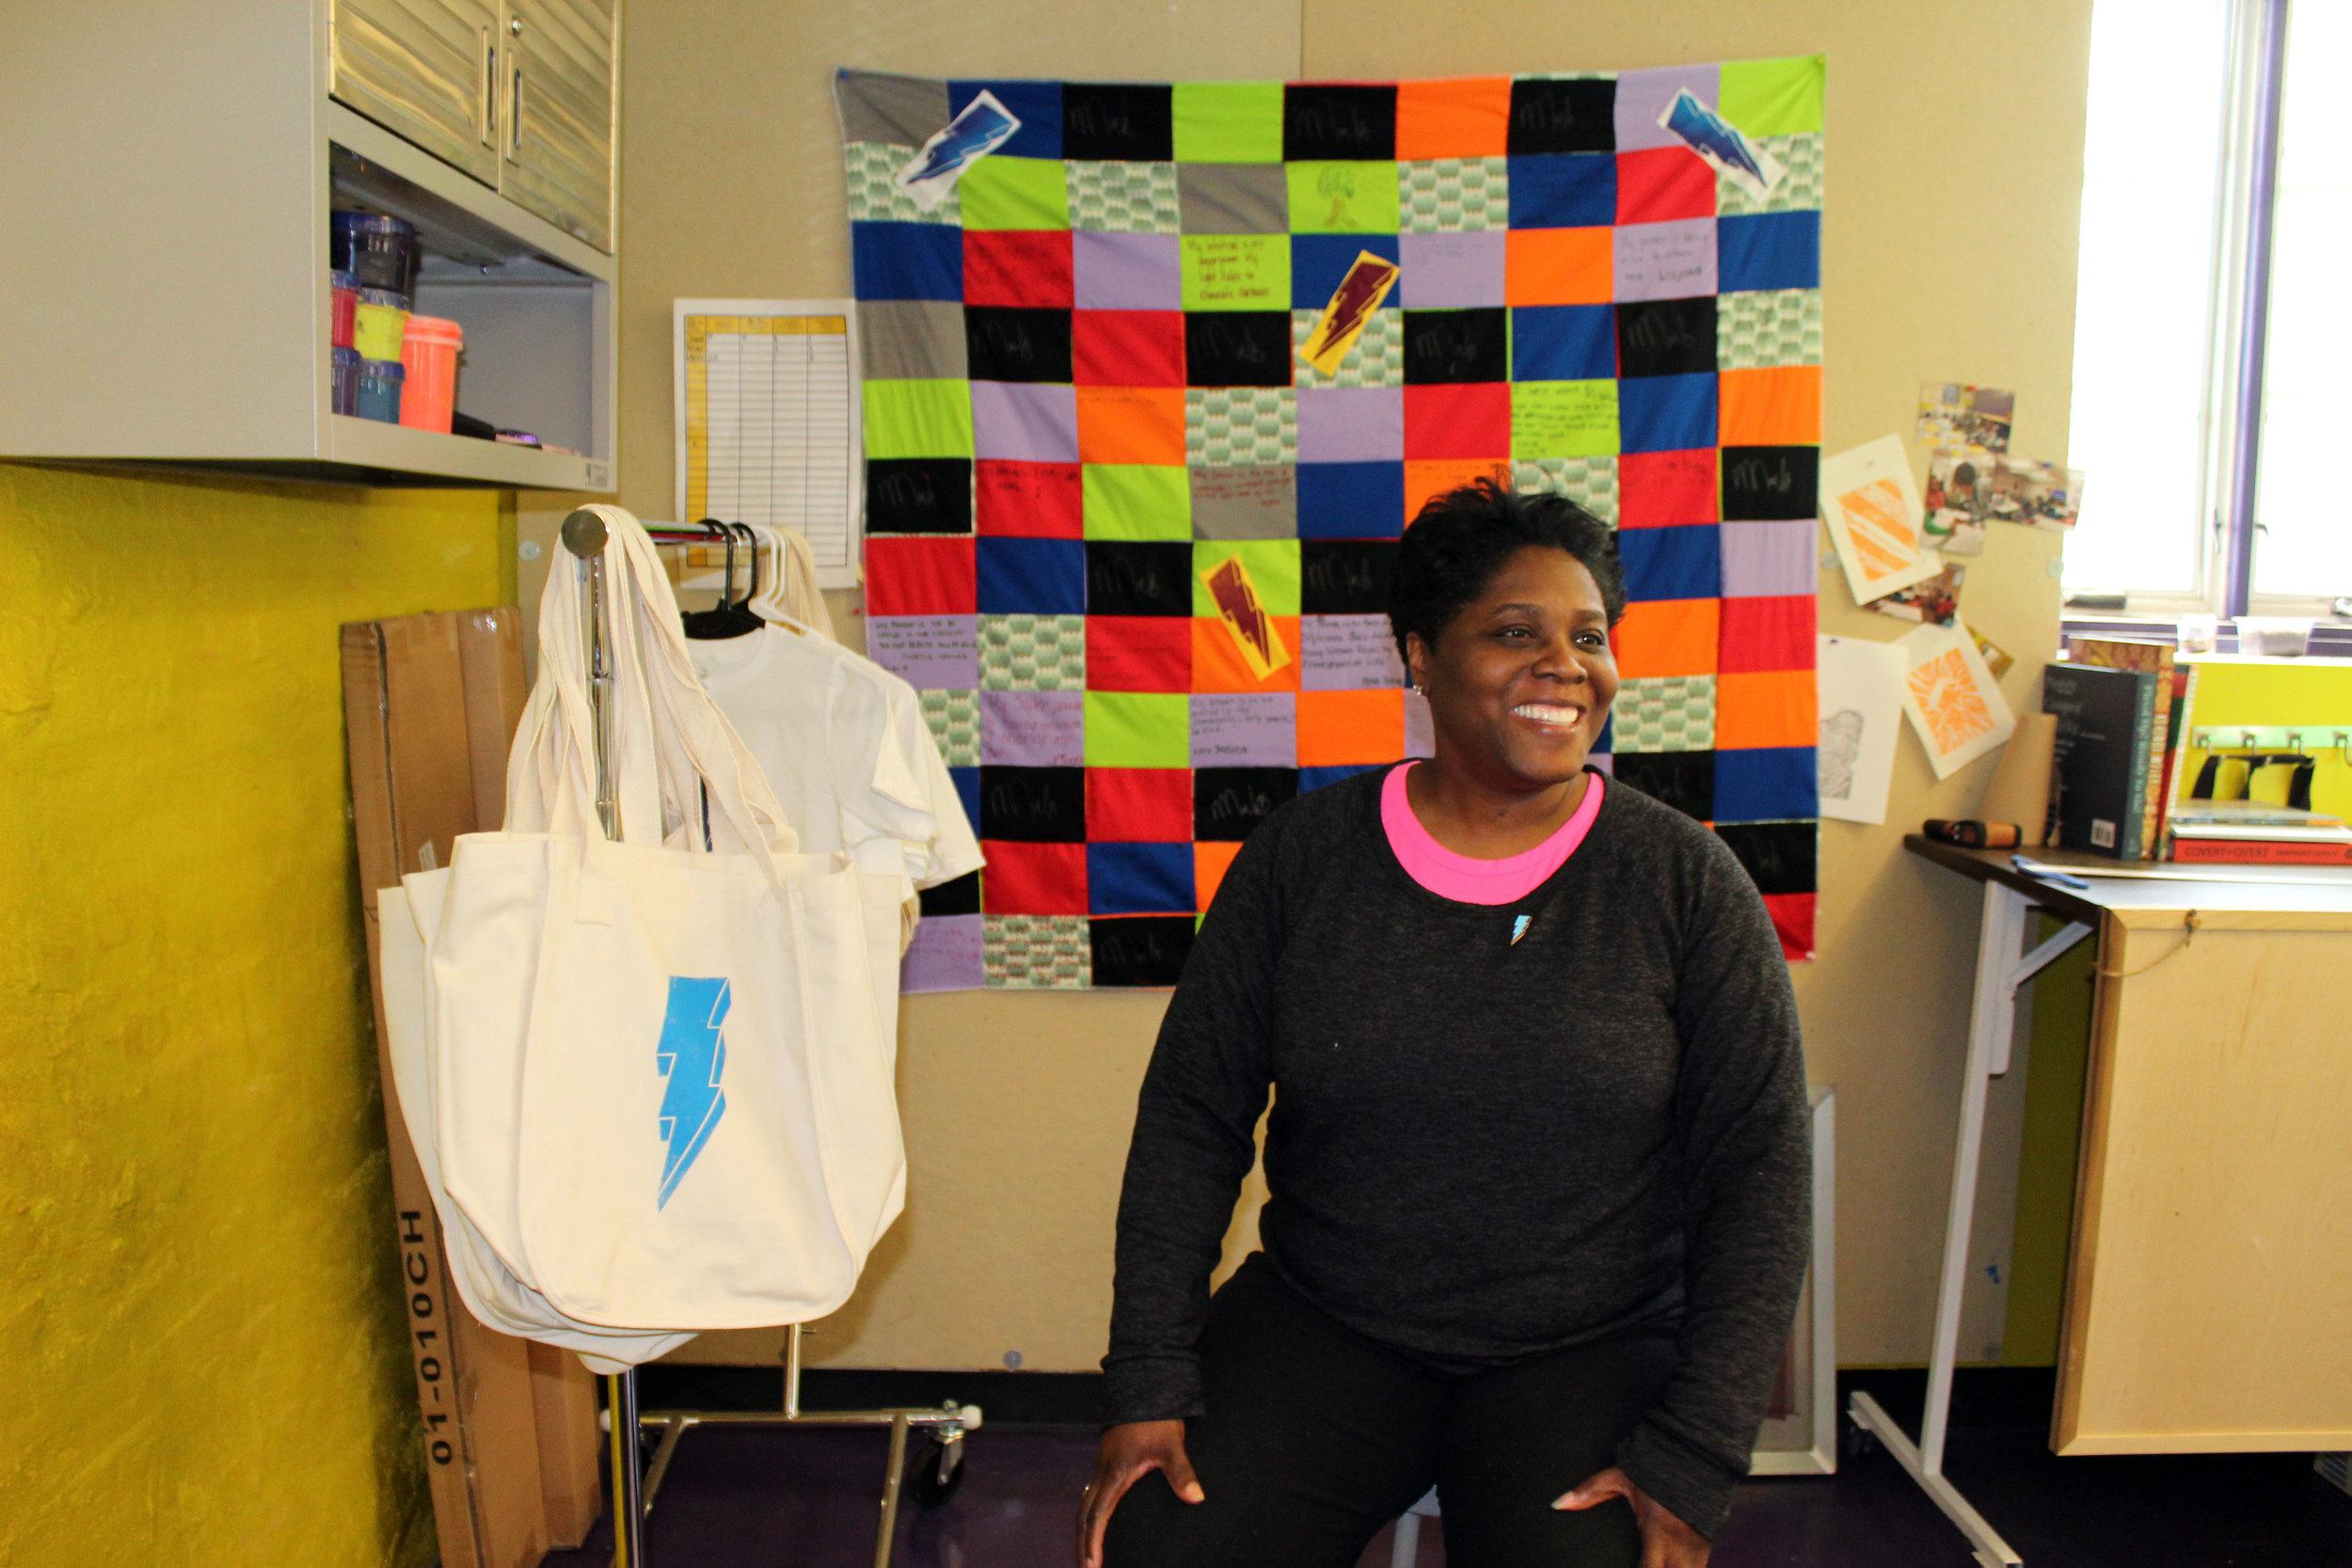 Kisha Webster, Founder of The Greenmount West Community Center Foundation